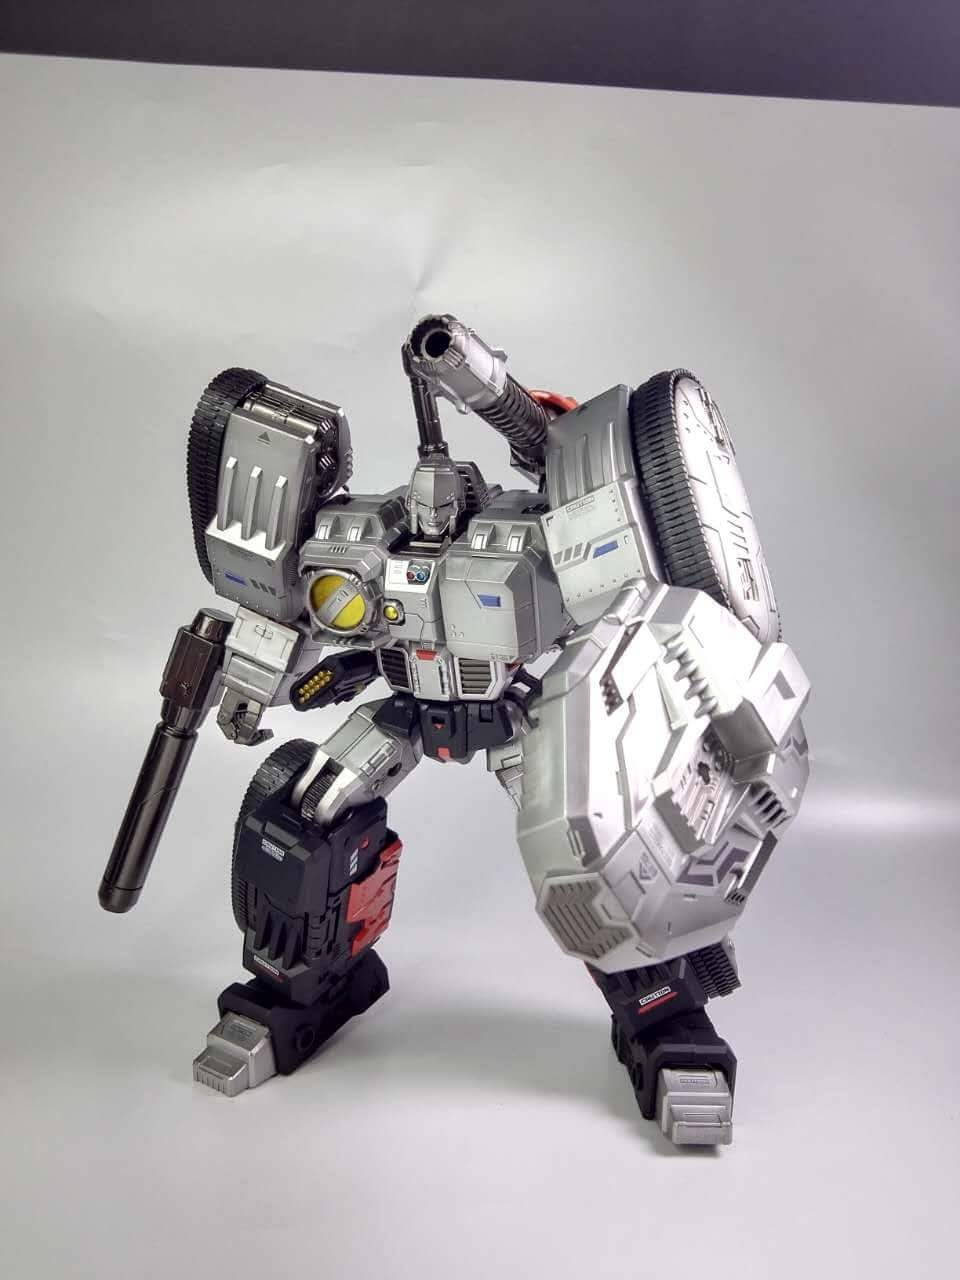 [SparkToys] Produit Tiers - ST - aka War Within: Optimus, Mégatron, Grimlock/La Menace, etc - Page 2 VQi11snZ